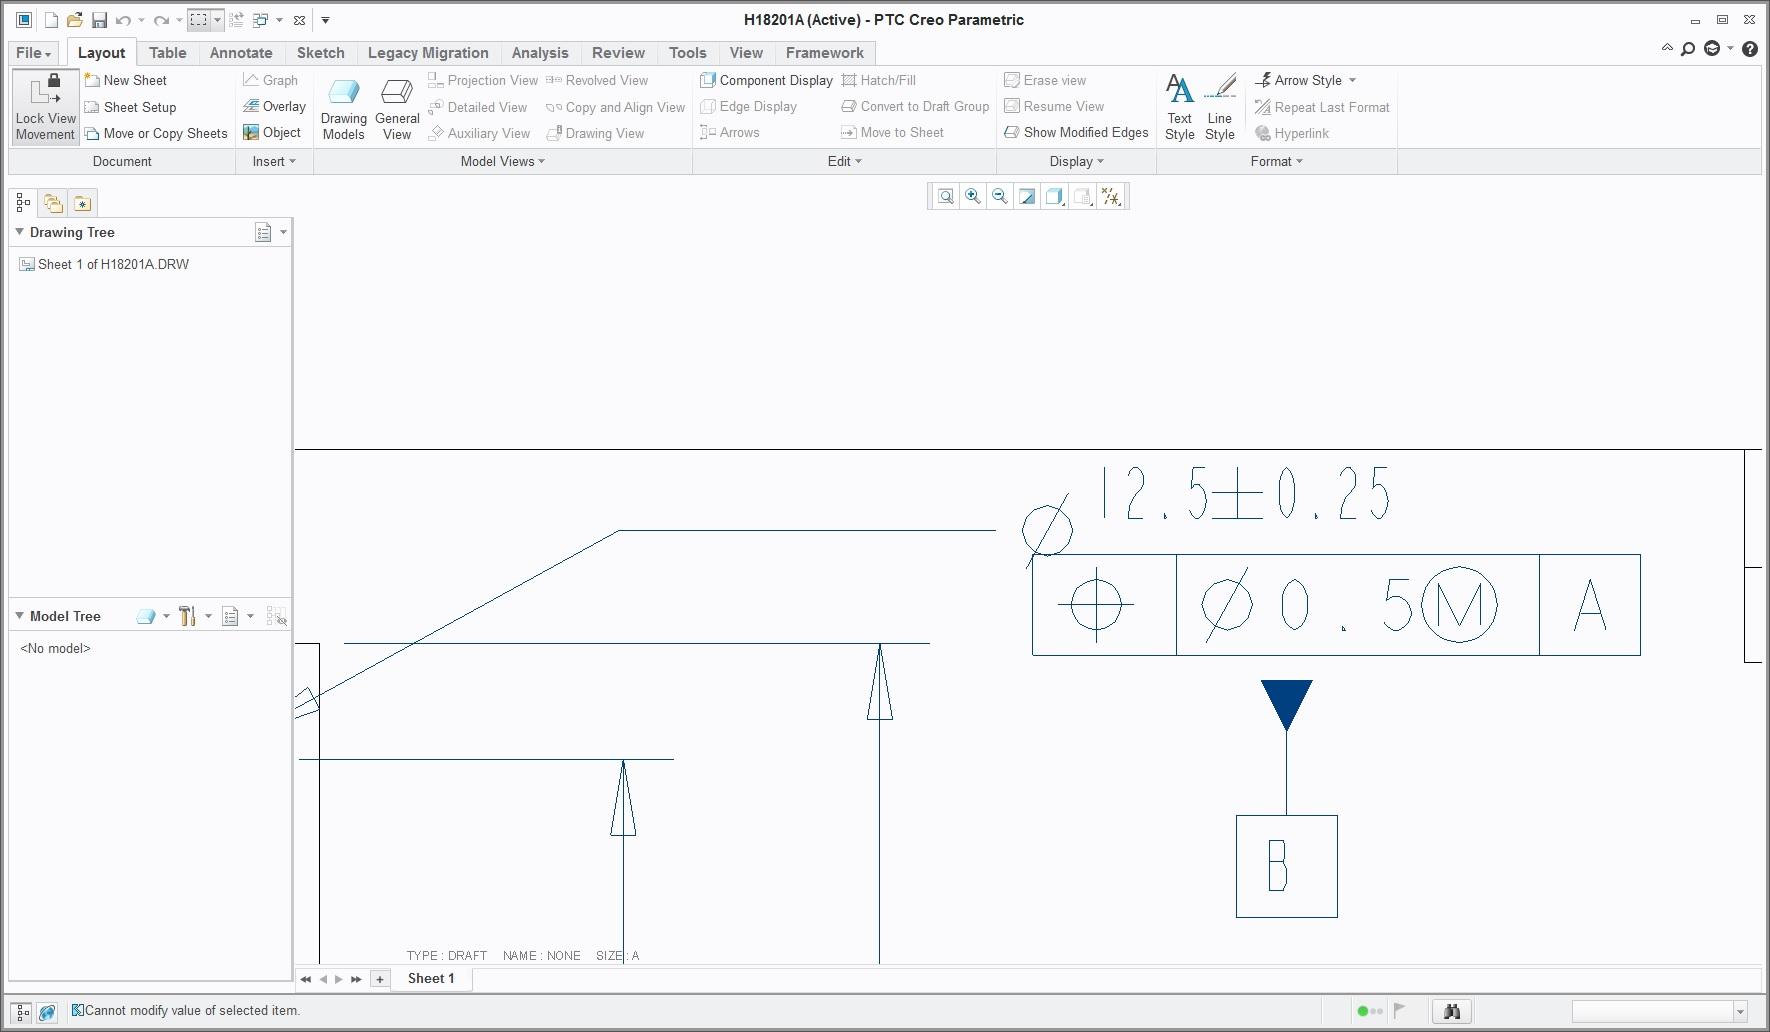 Editing import drawing data? - PTC Community